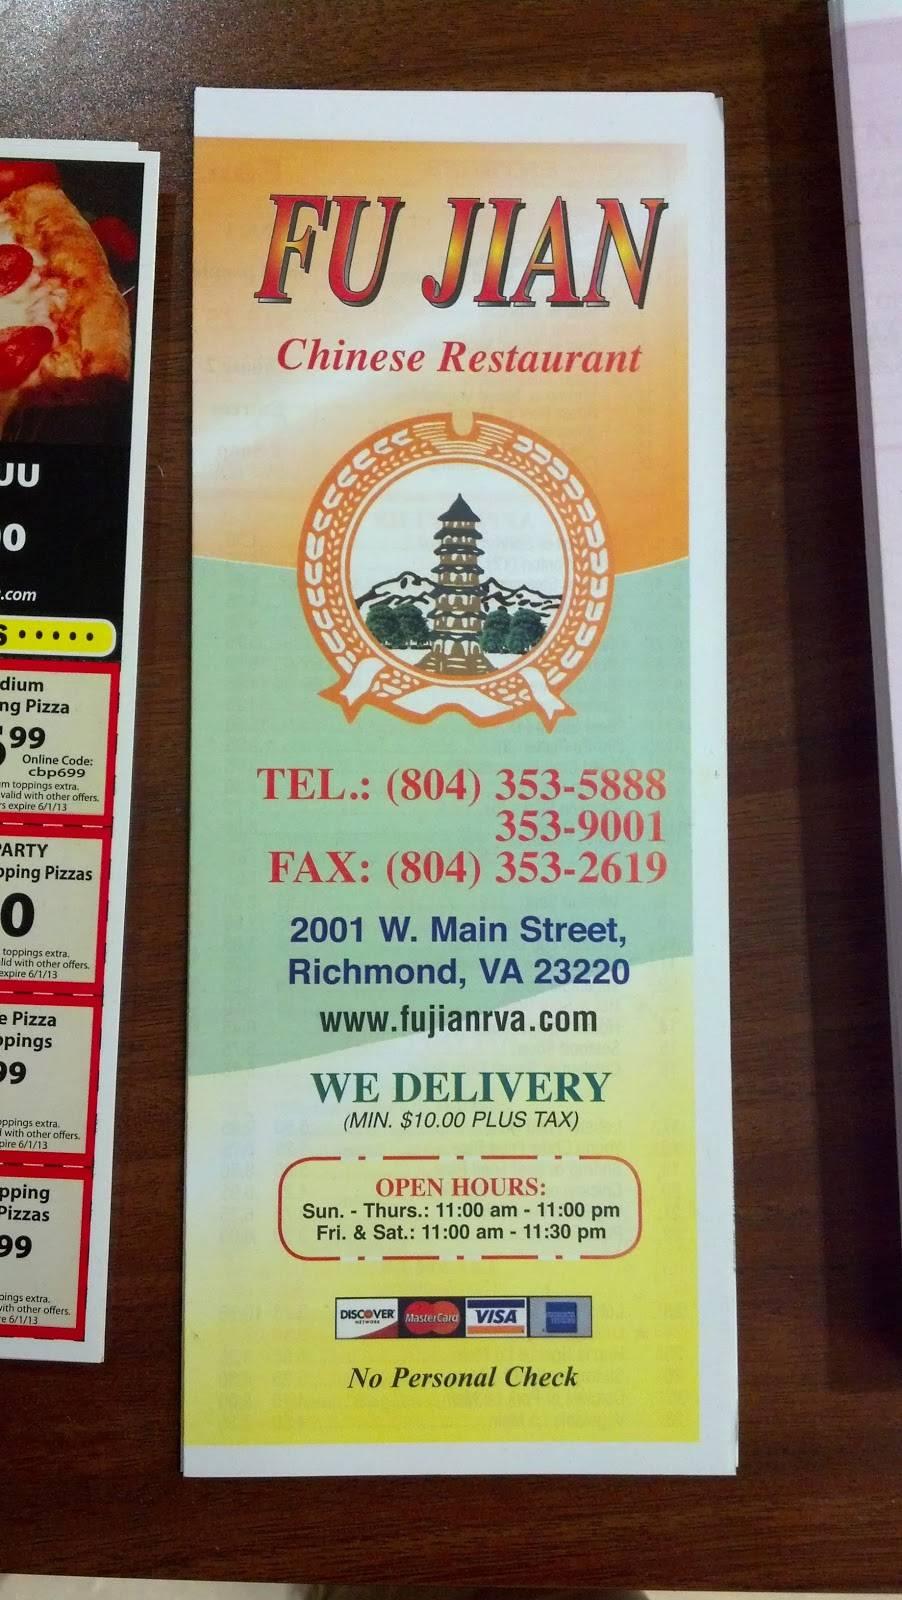 Fu Jian Chinese Restaurant | restaurant | 2001 W Main St, Richmond, VA 23220, USA | 8043535888 OR +1 804-353-5888